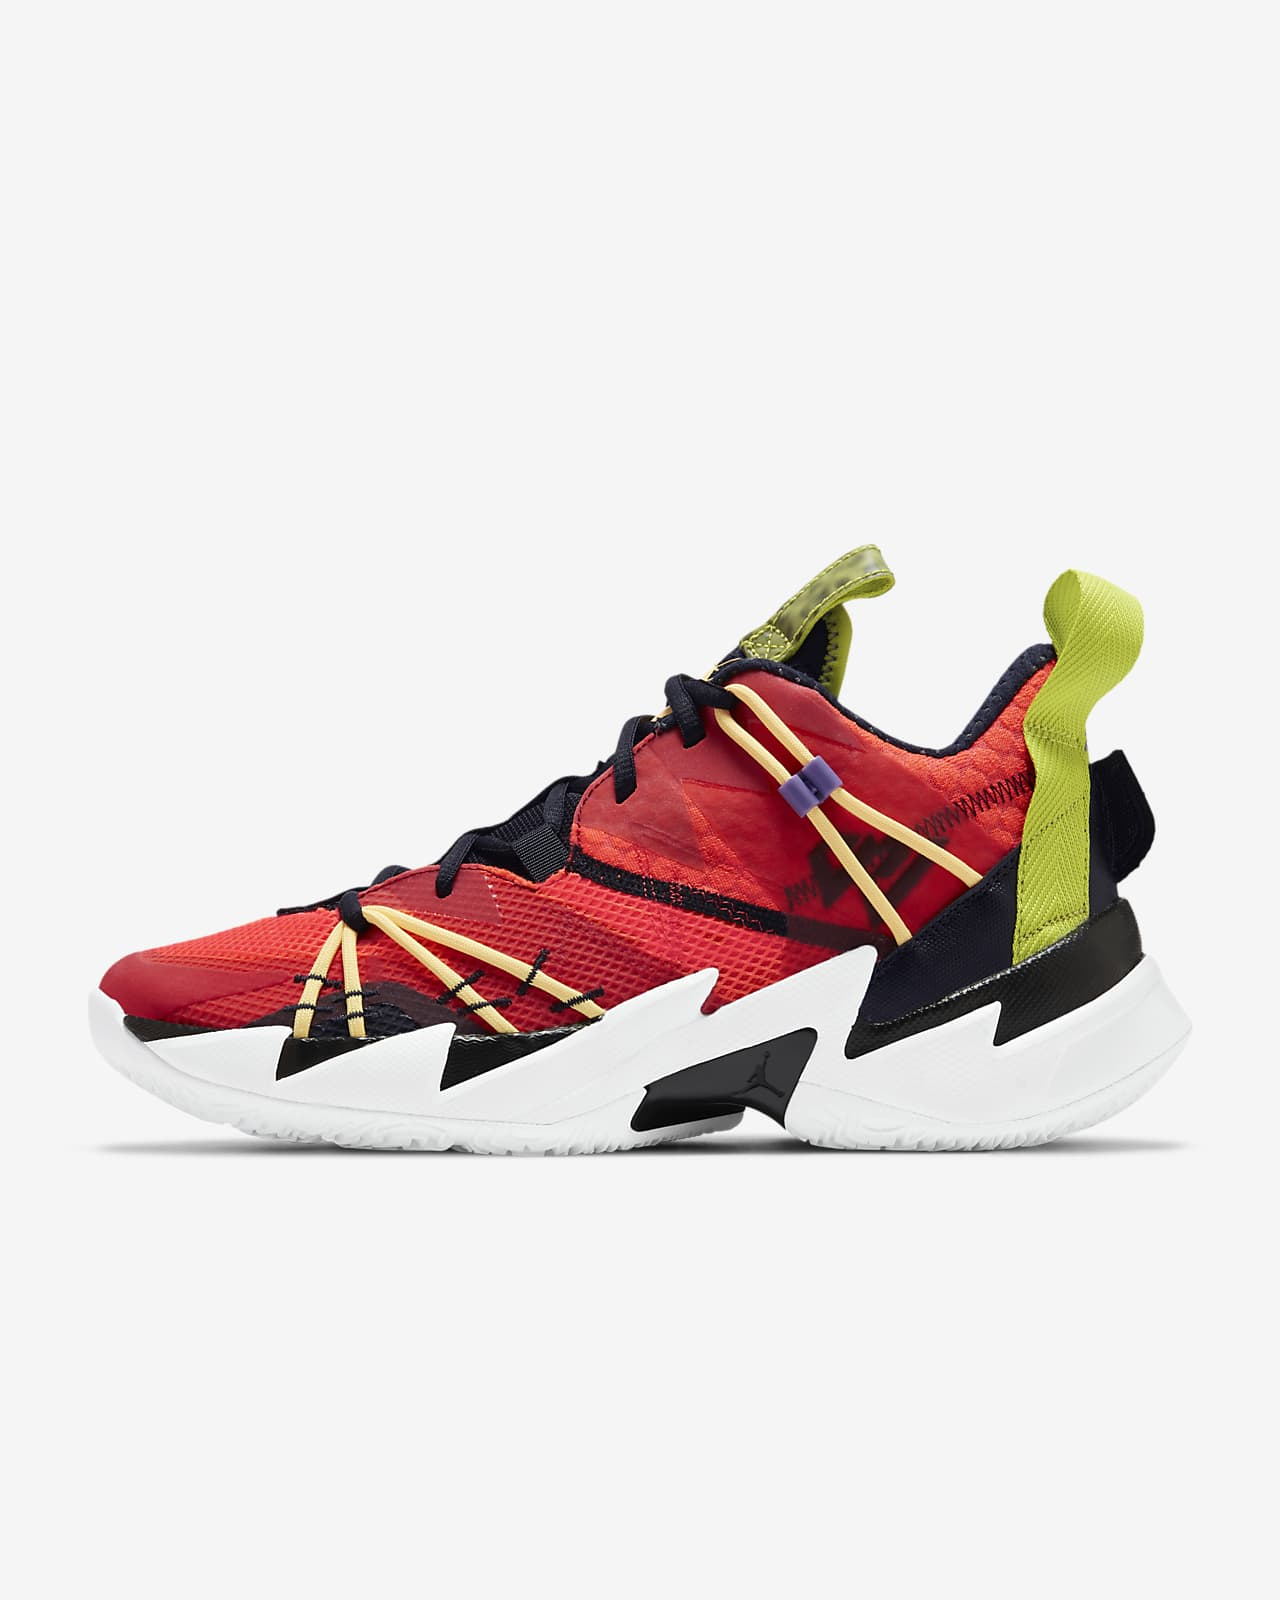 Jordan Why Not Zer0.3 SE PF 男子篮球鞋